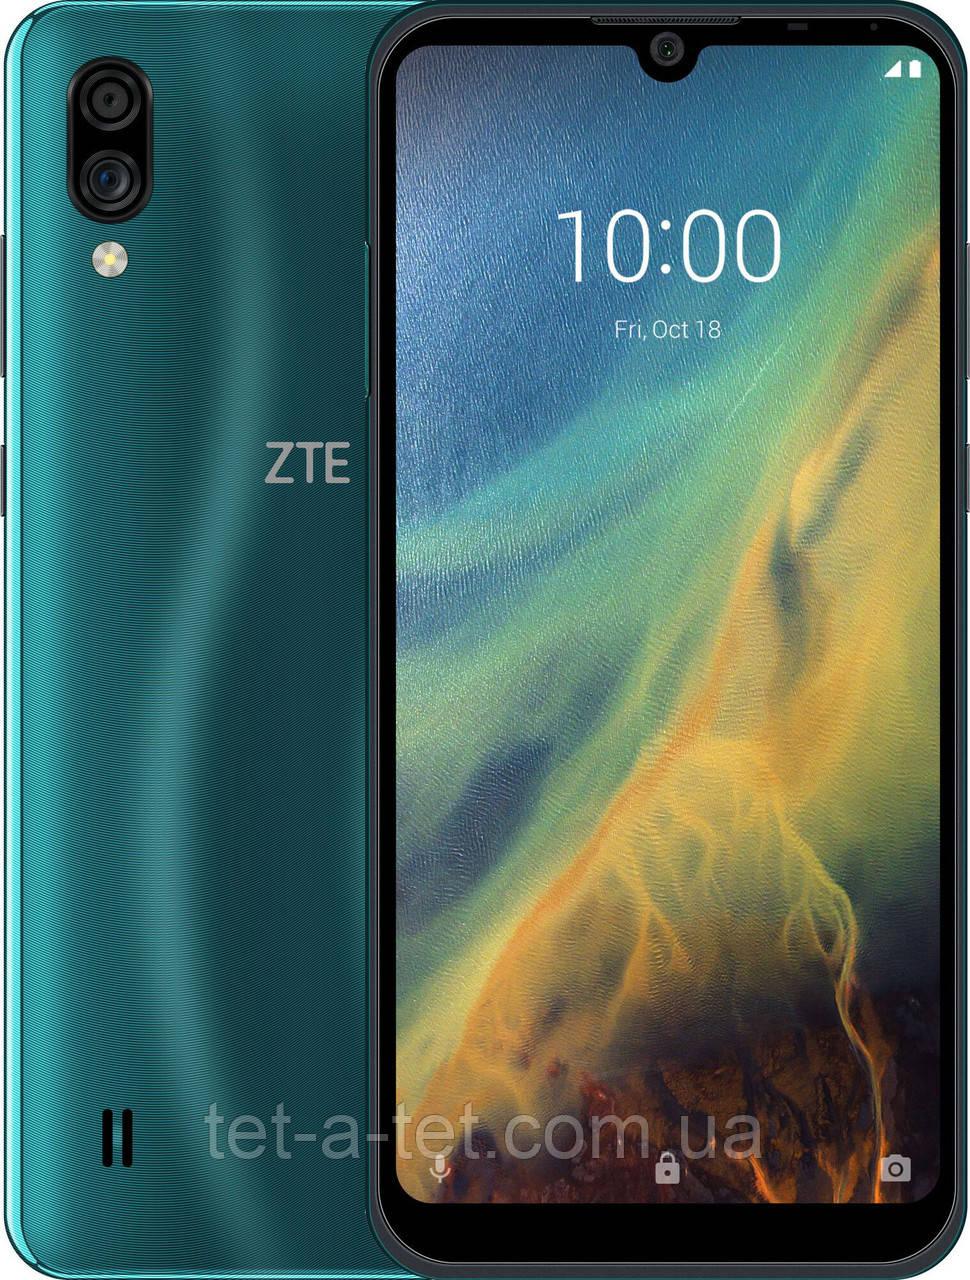 Смартфон ZTE Blade A5 2020 2/32GB Green (Зелений)